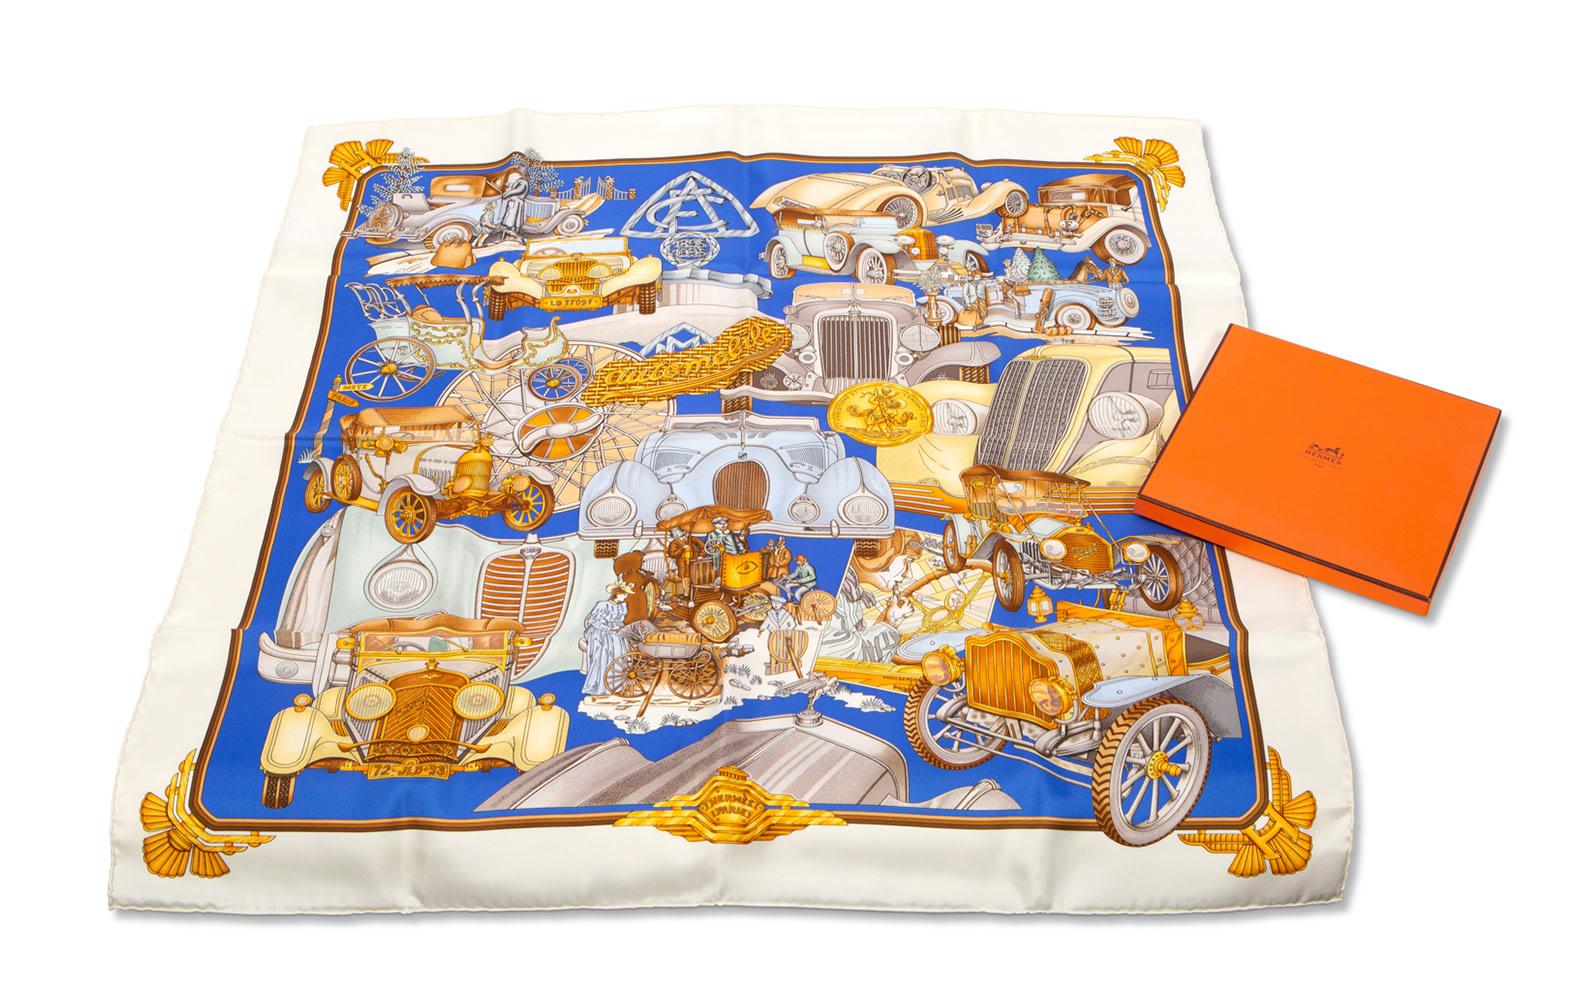 Assorted Silk Scarves by Hermès and Salvatore Ferragamo